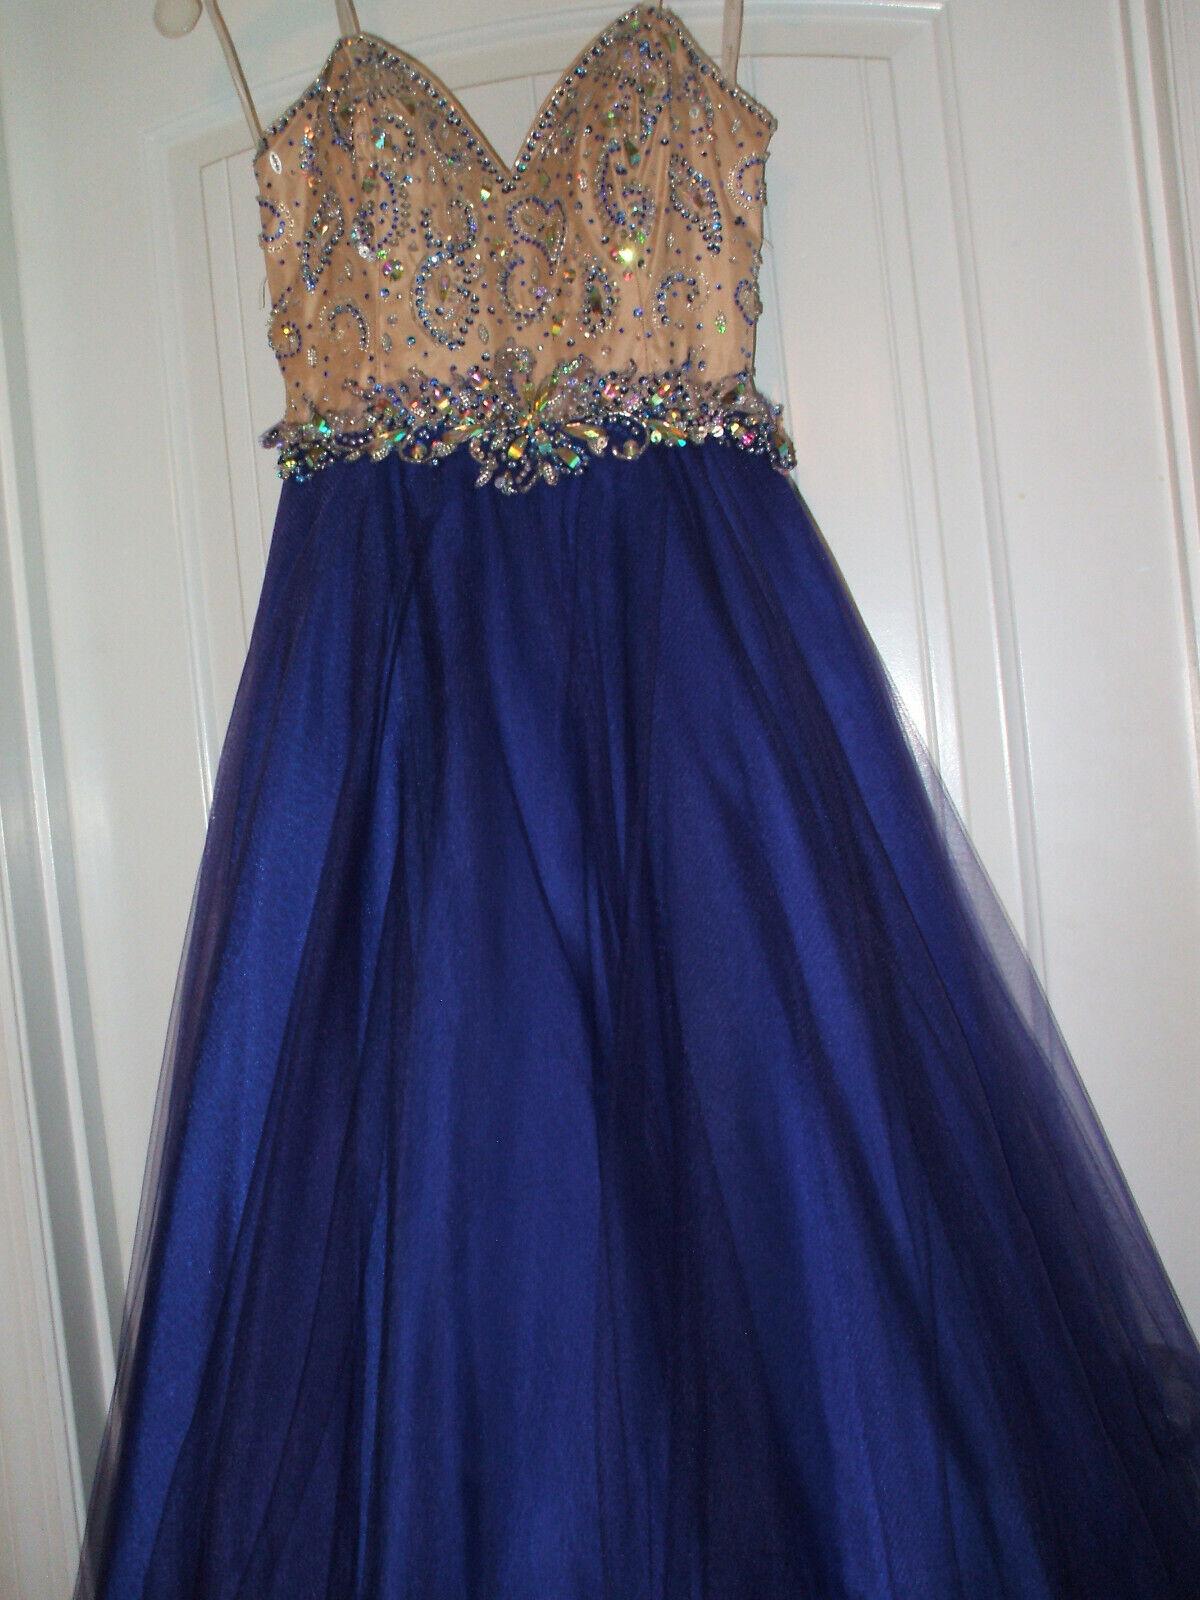 Formal long prom dress size 8